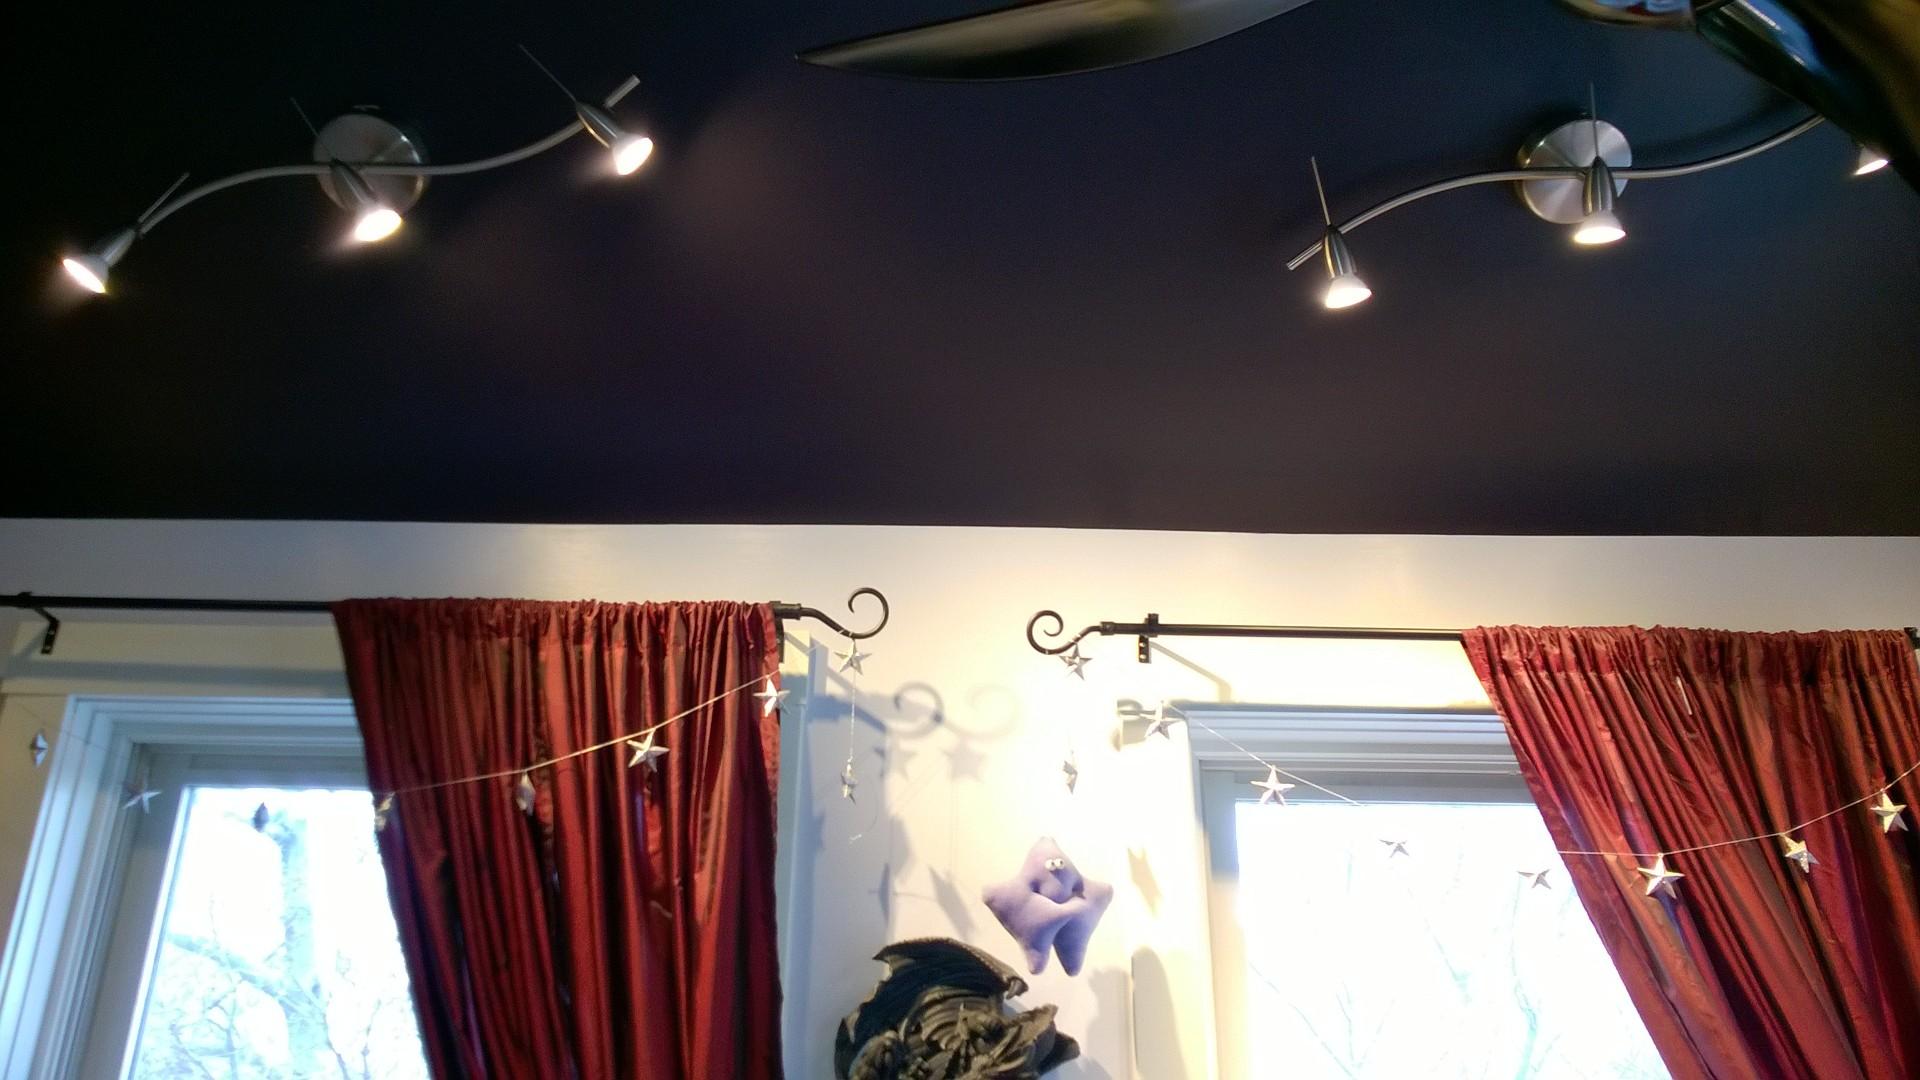 SÖdersvik Led Ceiling Lamp Ikea: Installing New IKEA Lighting In The Girl Cave